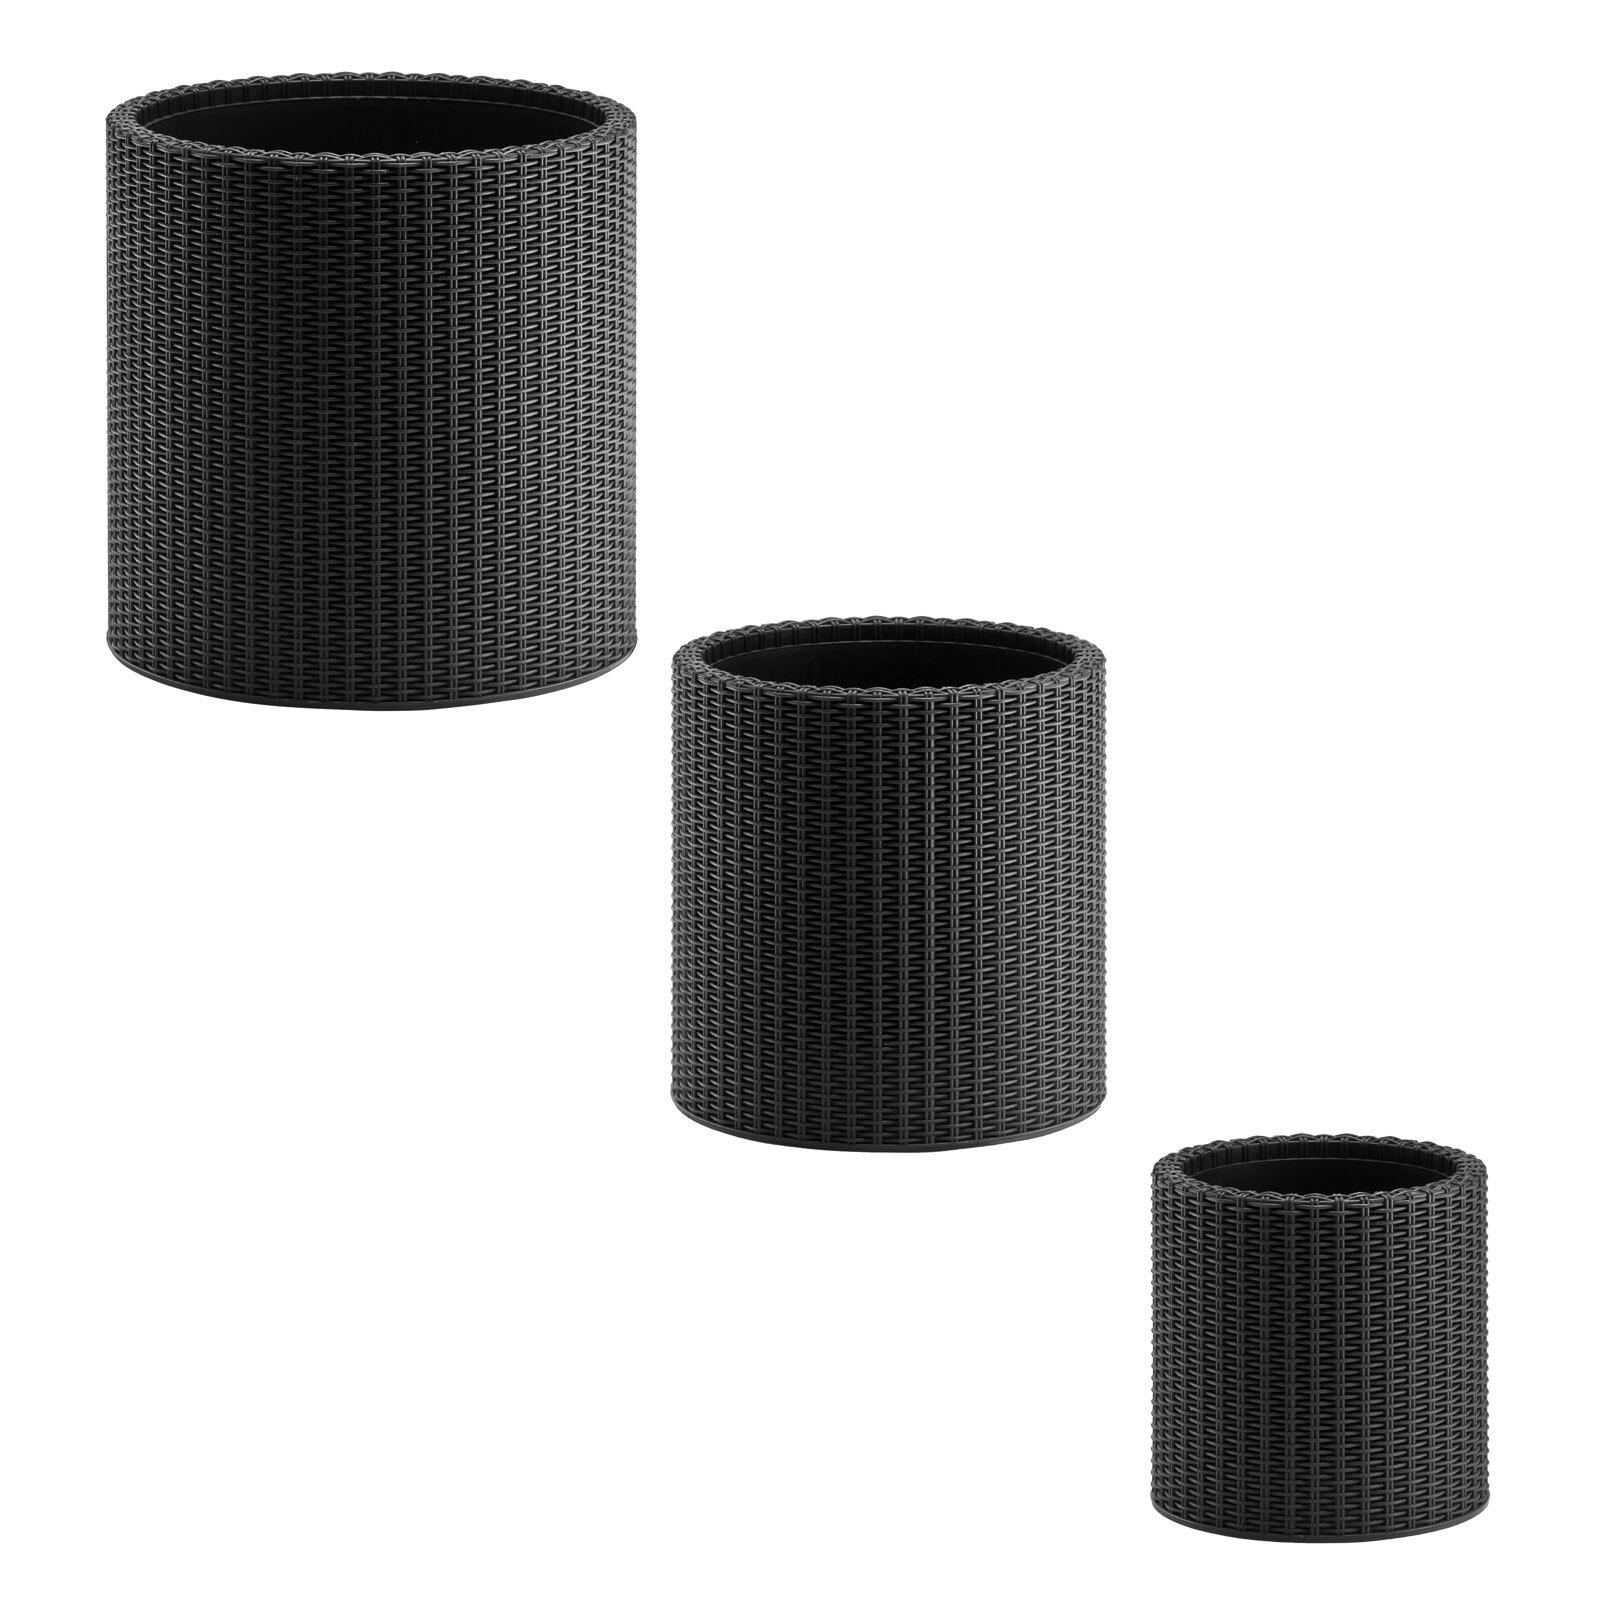 pflanzgef blumentopf pflanzk bel blumenk bel set rattan 3 tlg anthrazit ebay. Black Bedroom Furniture Sets. Home Design Ideas